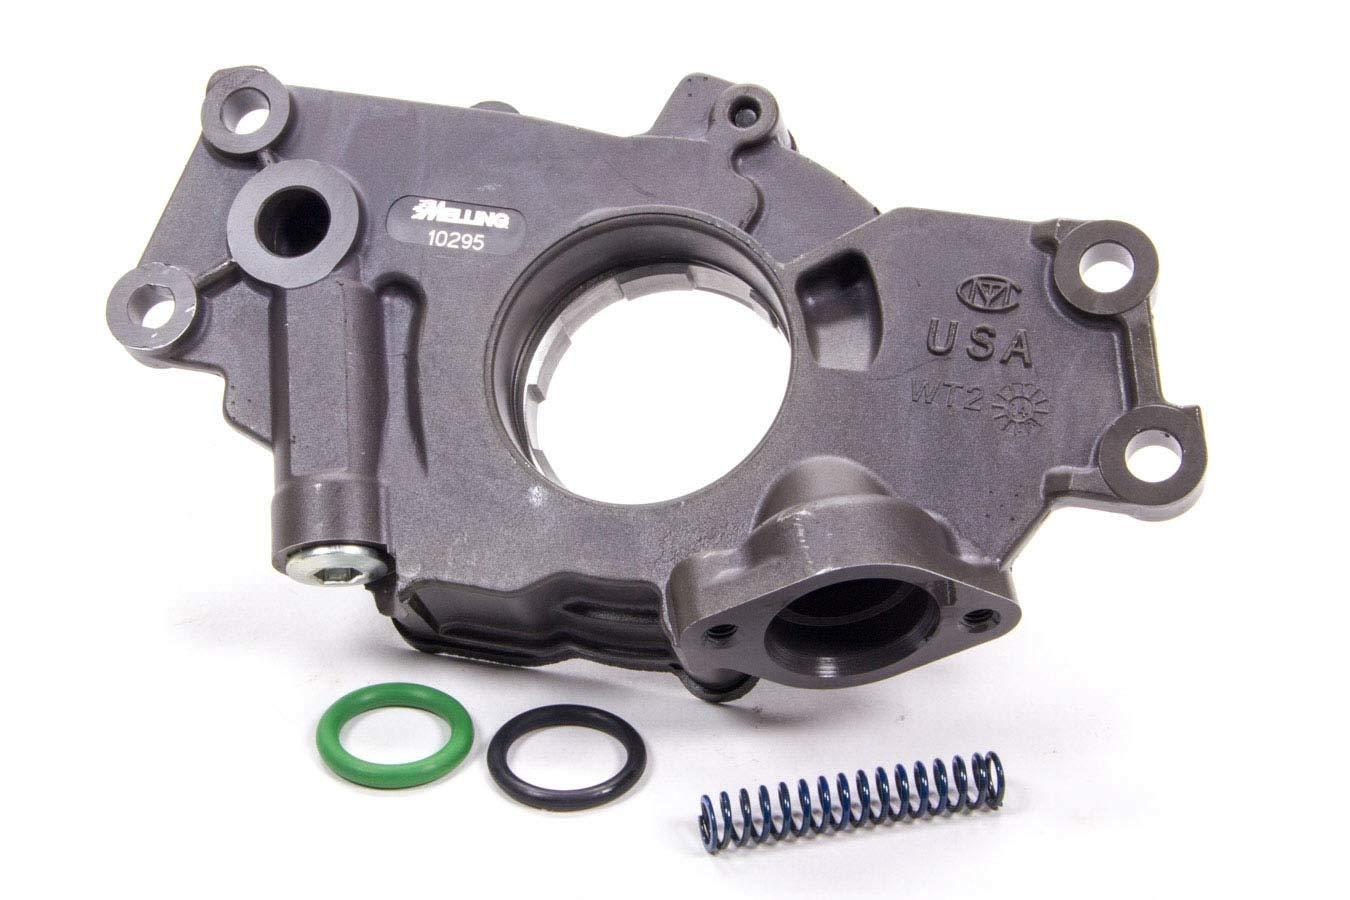 Melling-10295 Oil Pump, Wet Sump, Internal, Standard Volume, High Pressure, GM LS-Series, Each